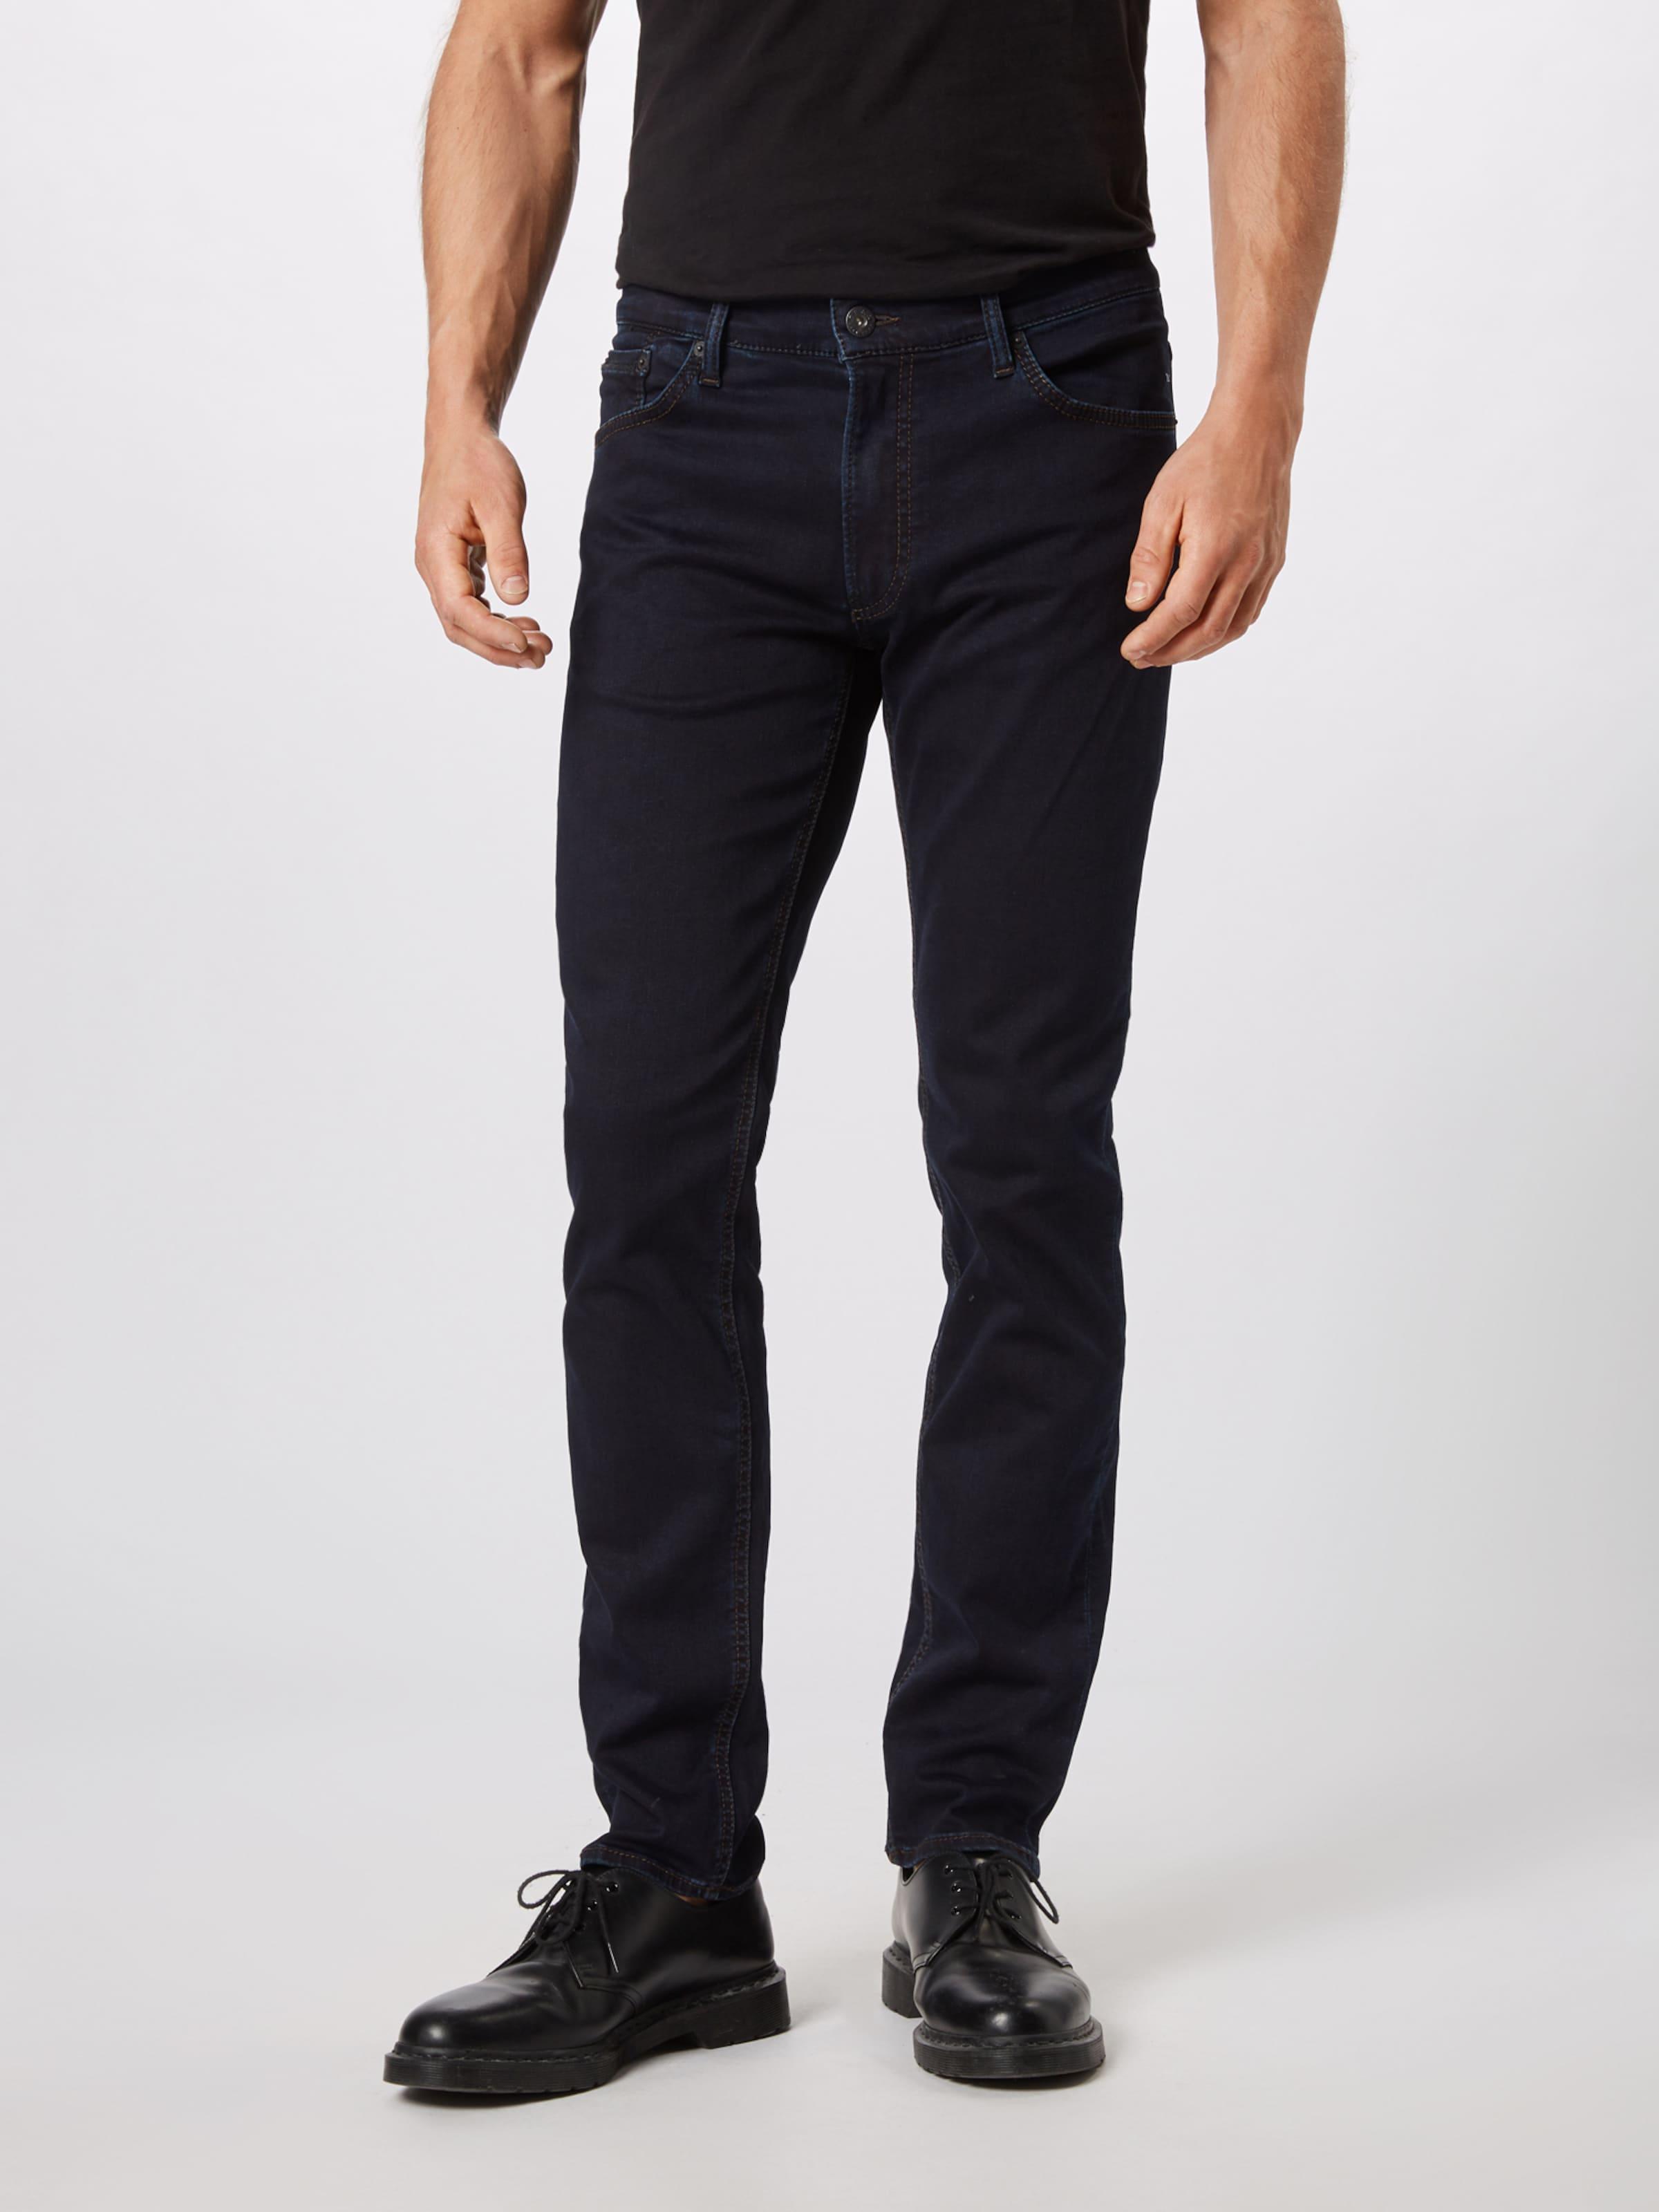 Jeans Blue Brax Denim 'chuck' In vn0wNOm8